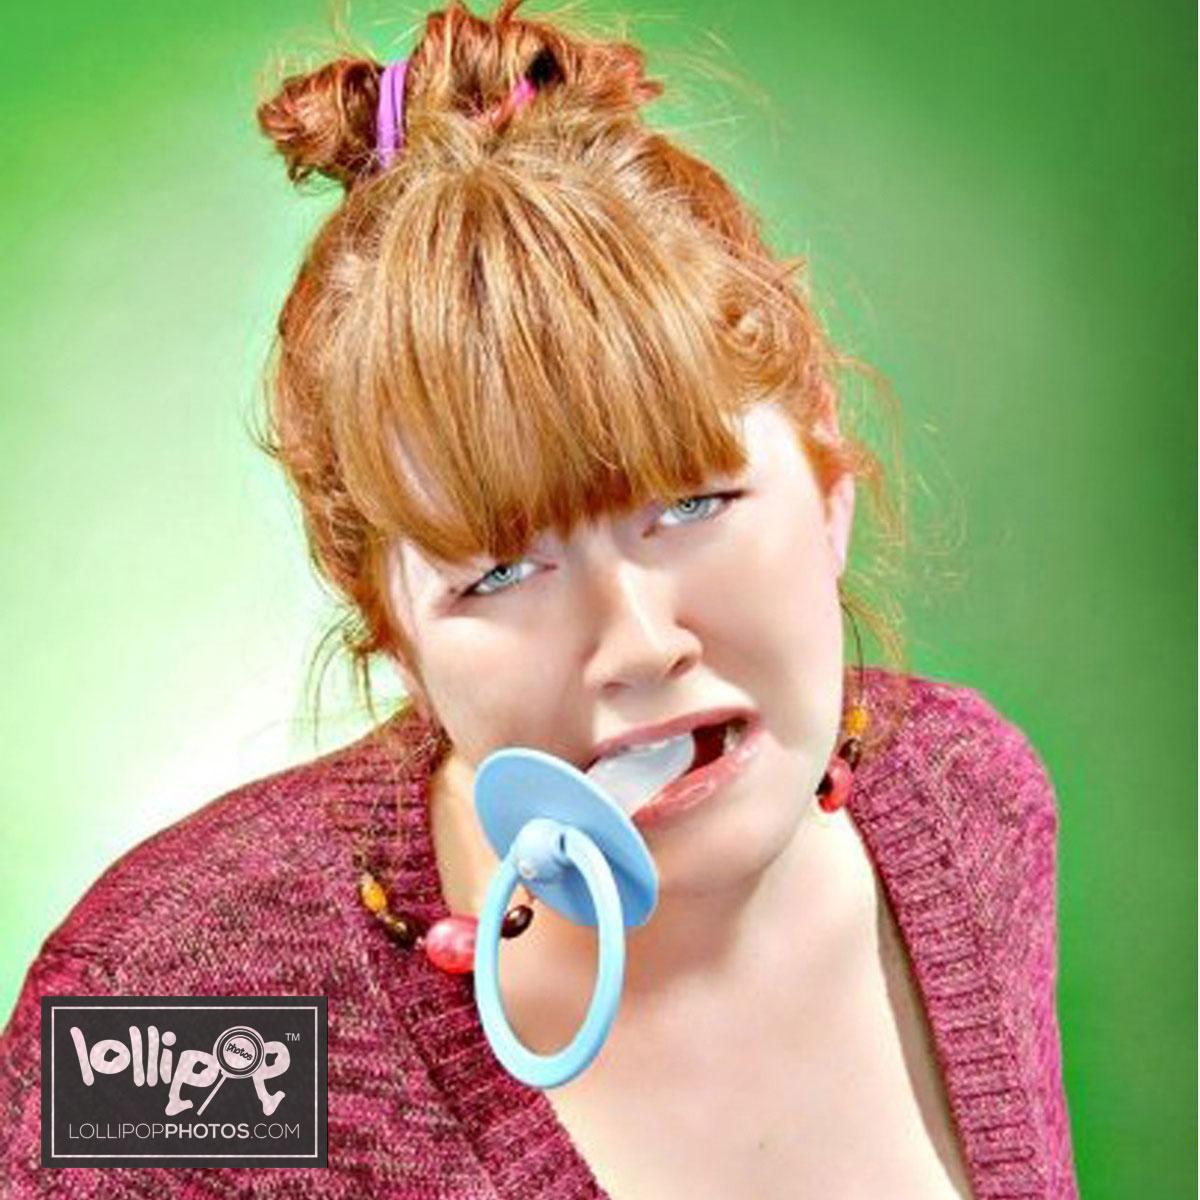 msdig-nora-canfield-lollipop-photos-160.jpg